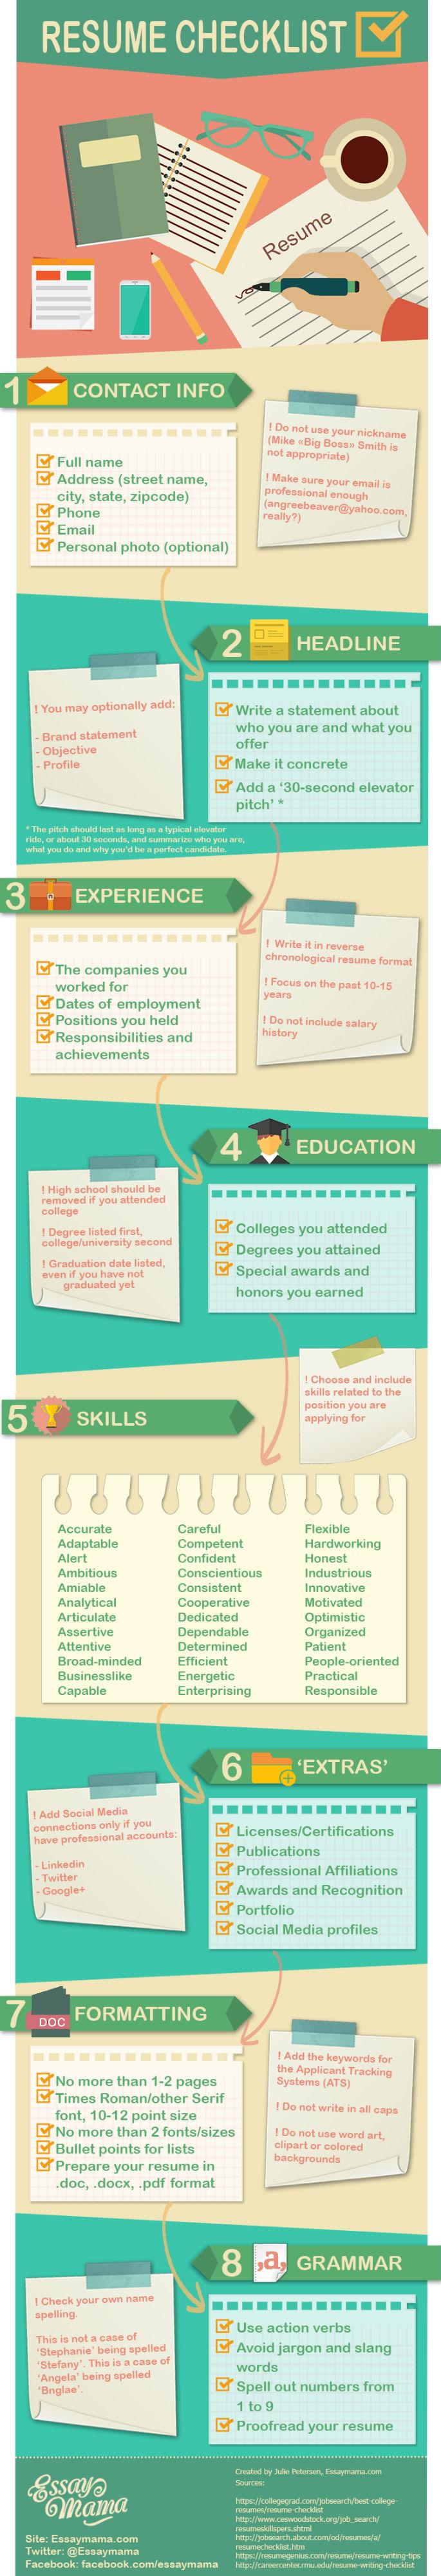 Resume Checklist [Infographic]